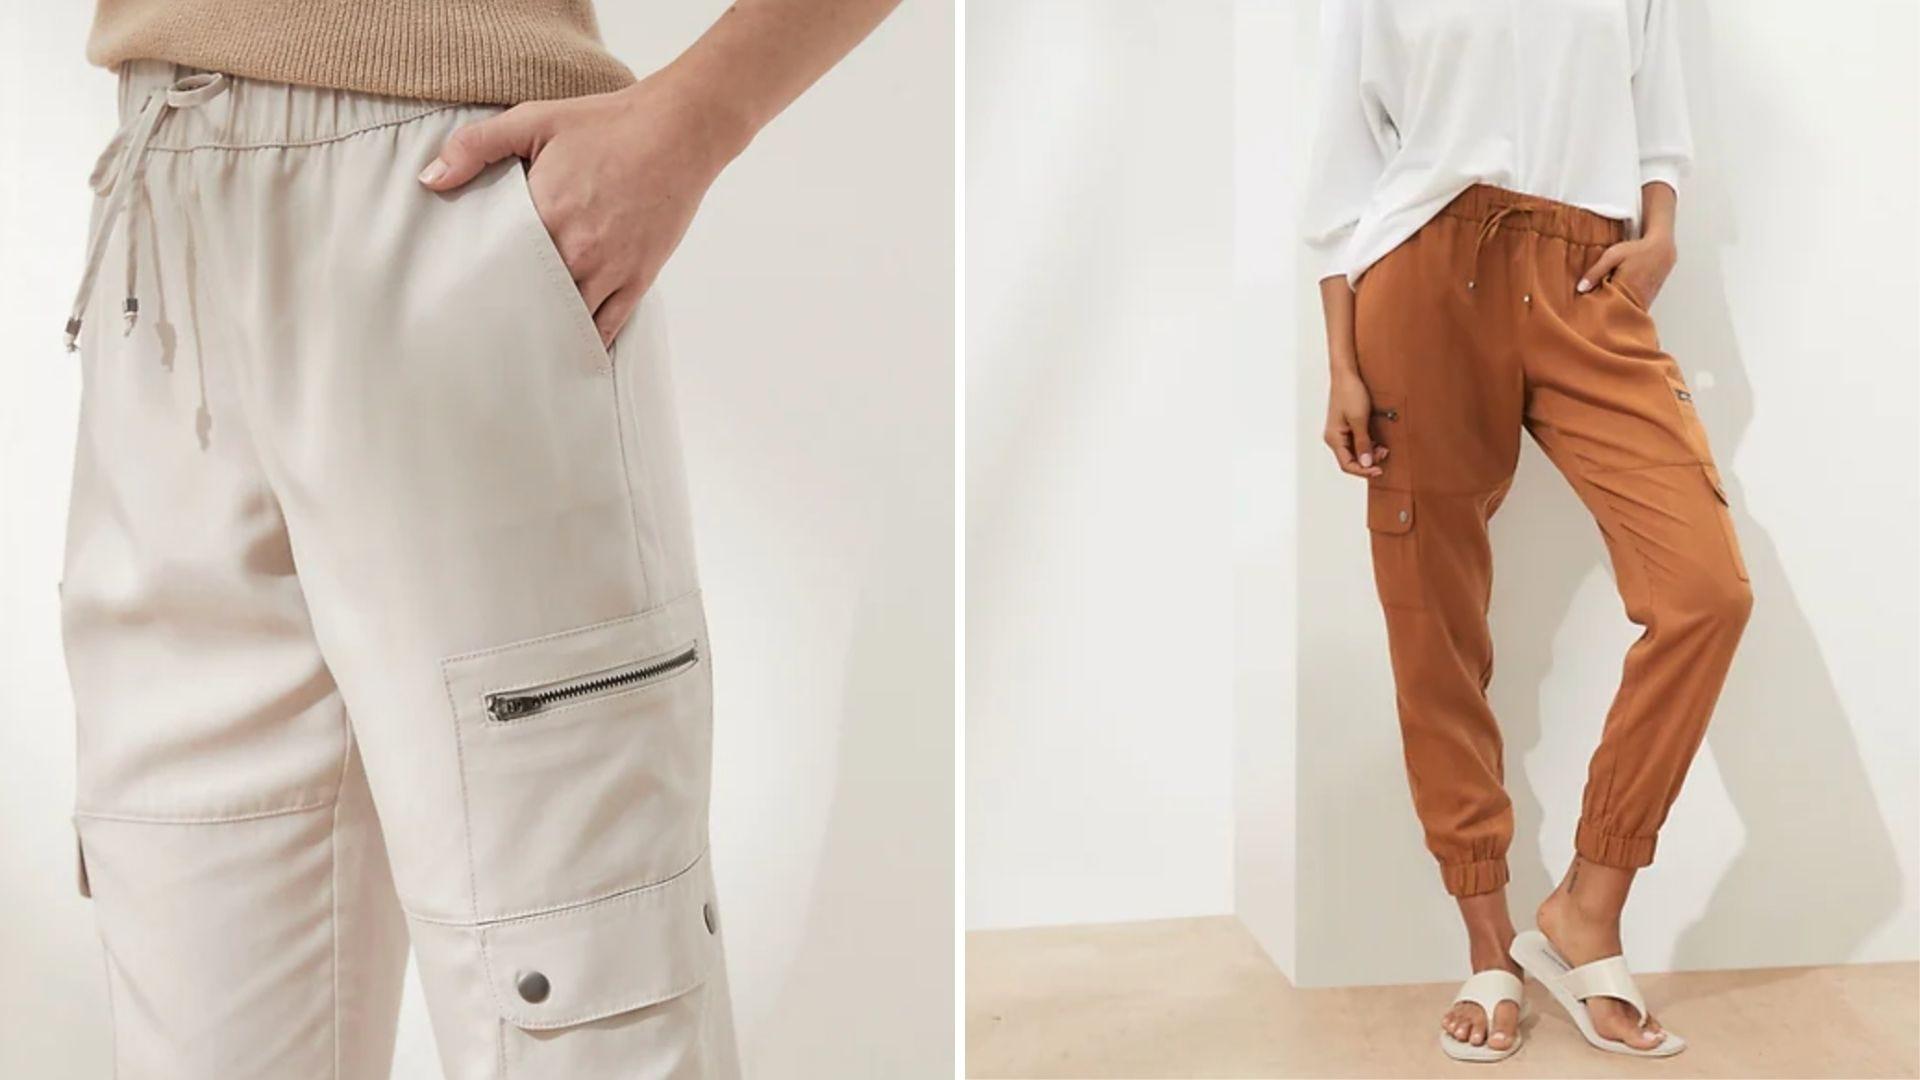 A woman wears white pants and a woman wears burnt orange pants